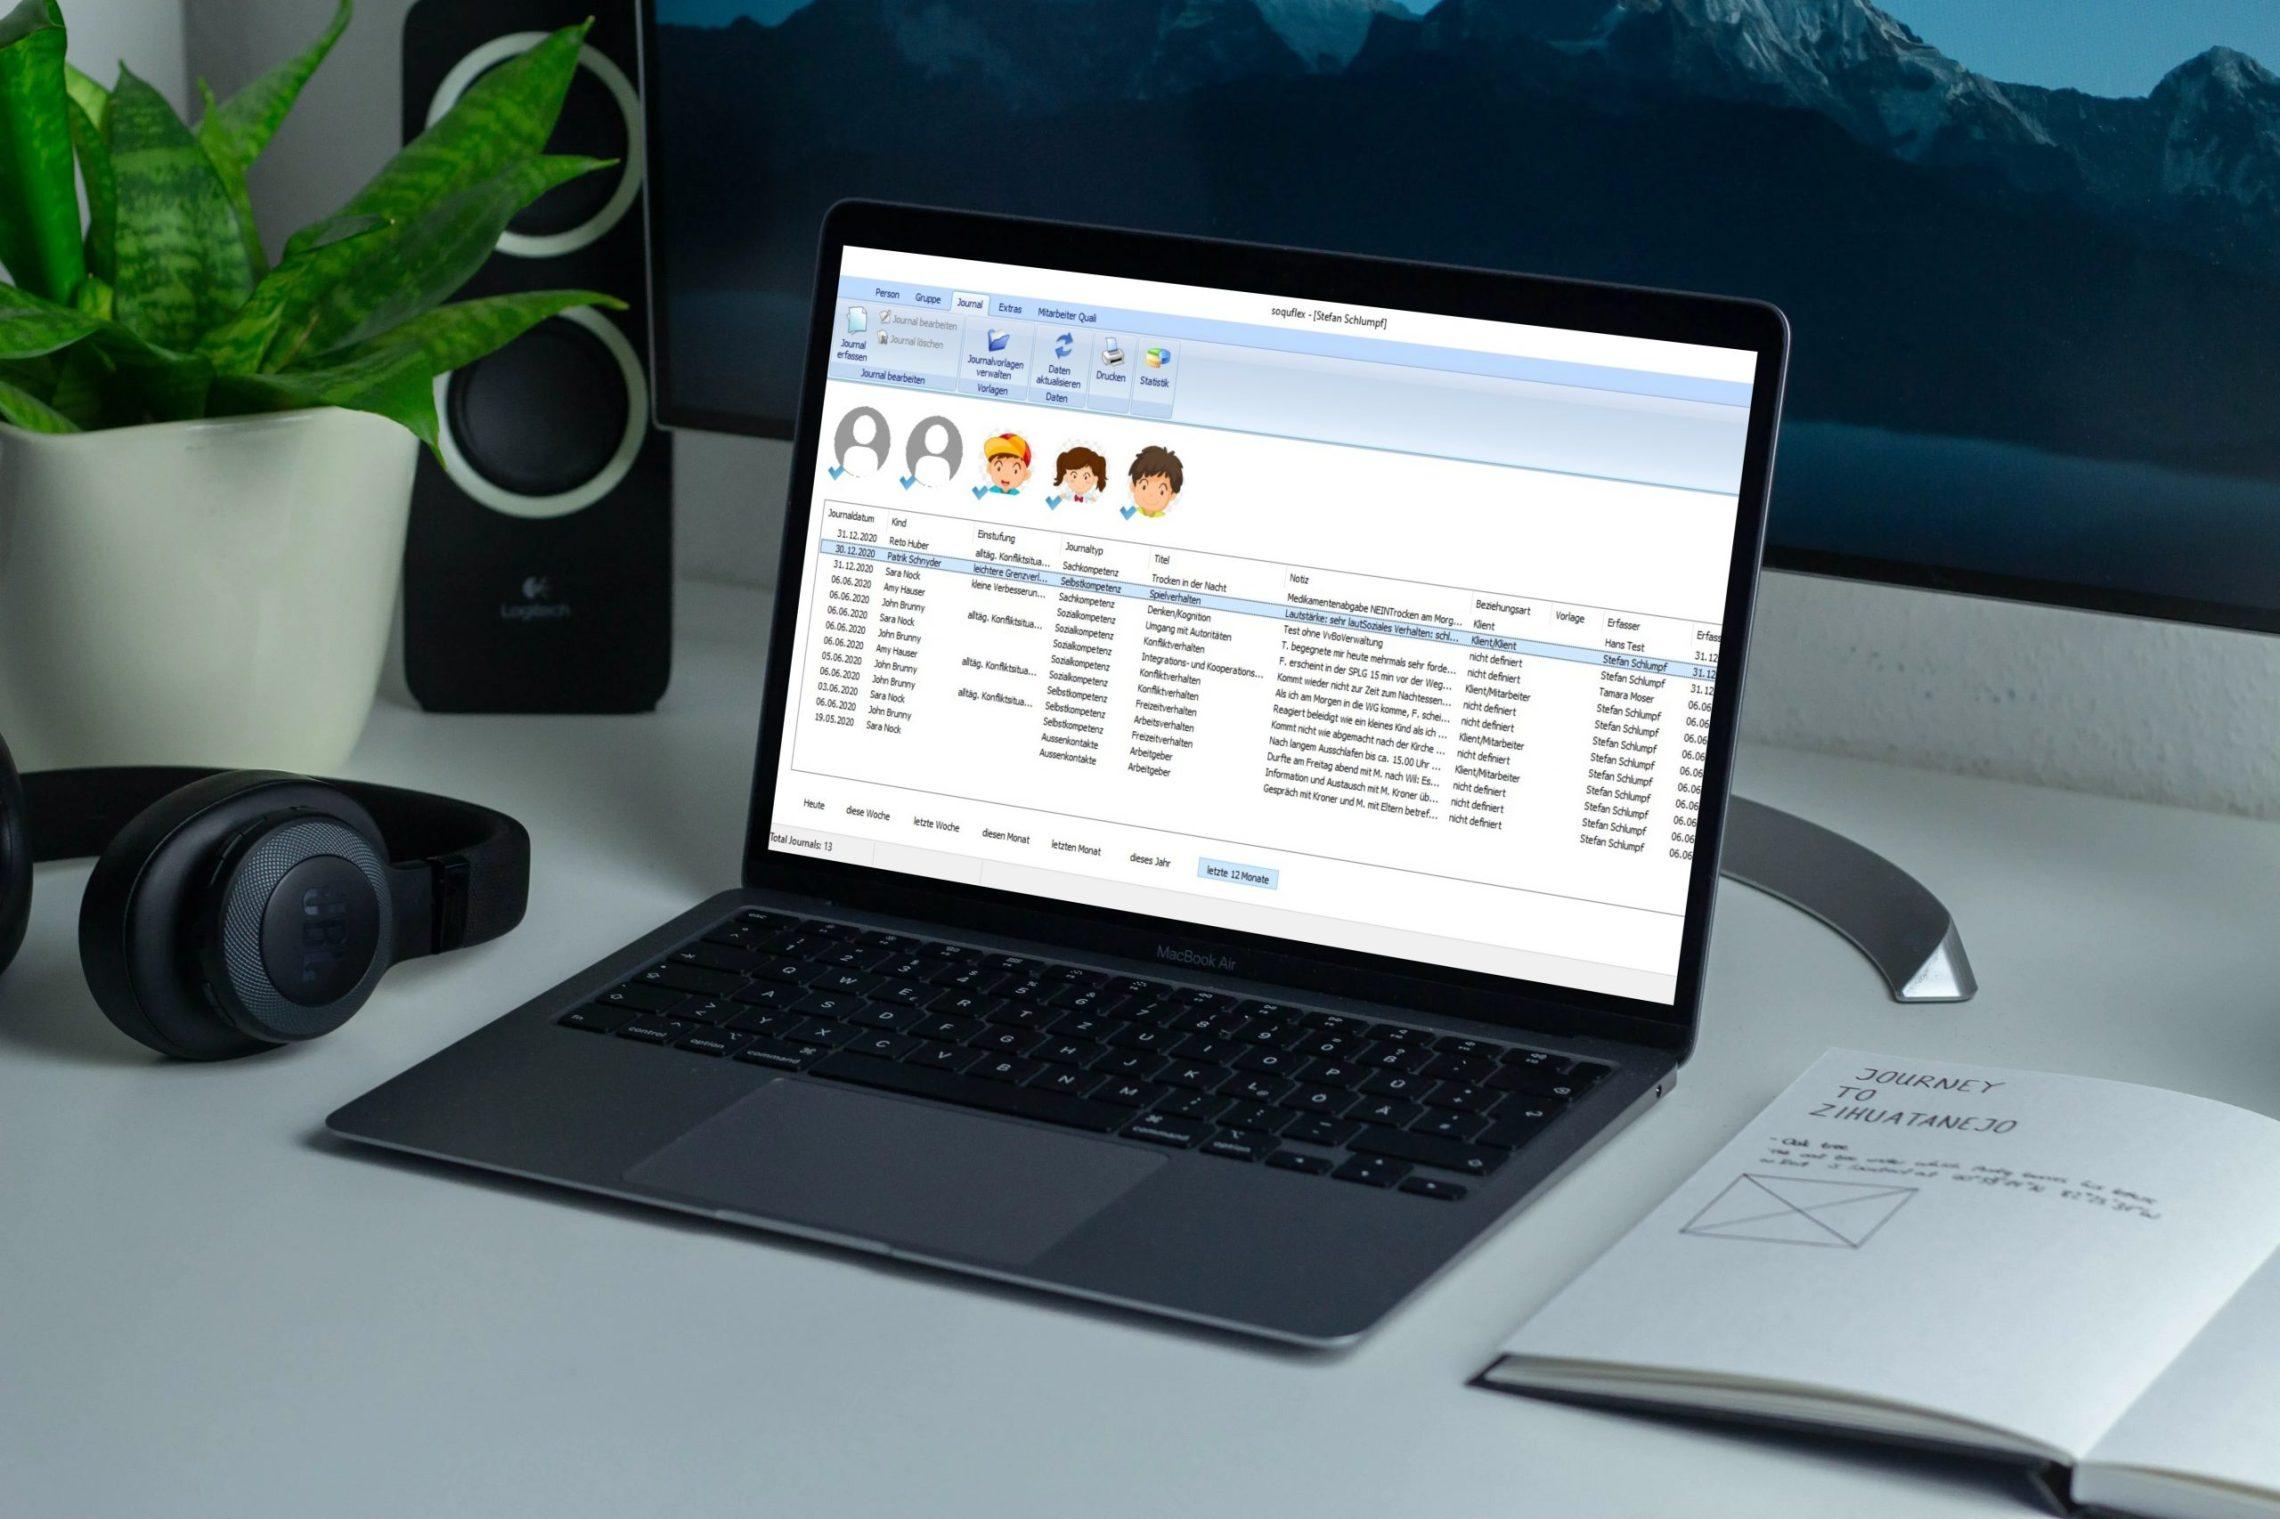 Soquflex Is A Smart Delphi-Developed Application That Simplifies Socio-Pedagogical Processes